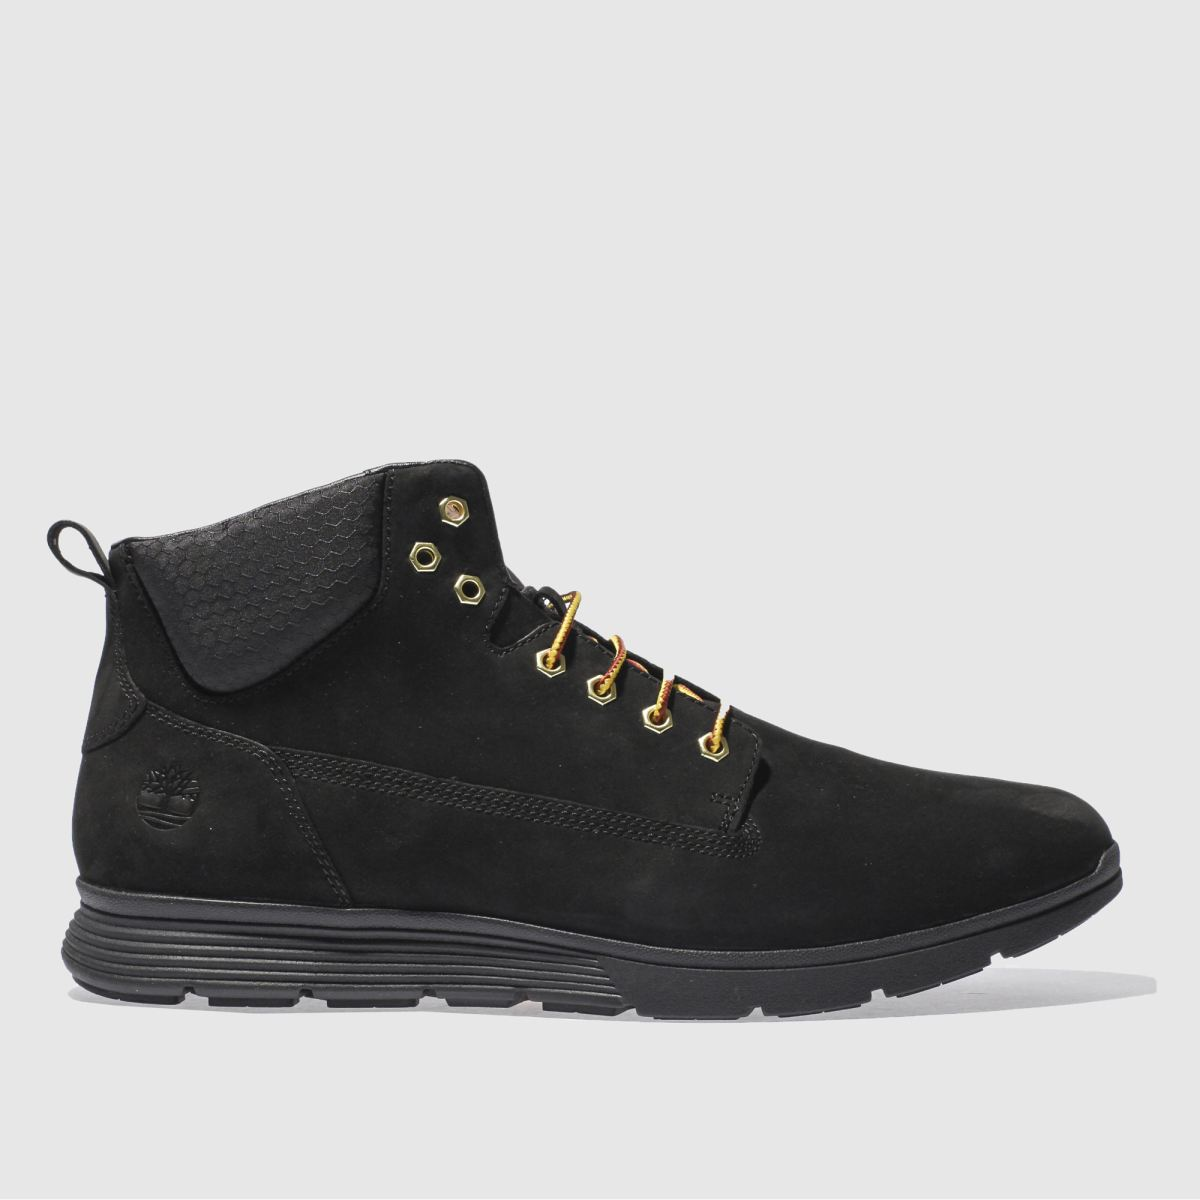 Timberland Black Killington Chukka Boots